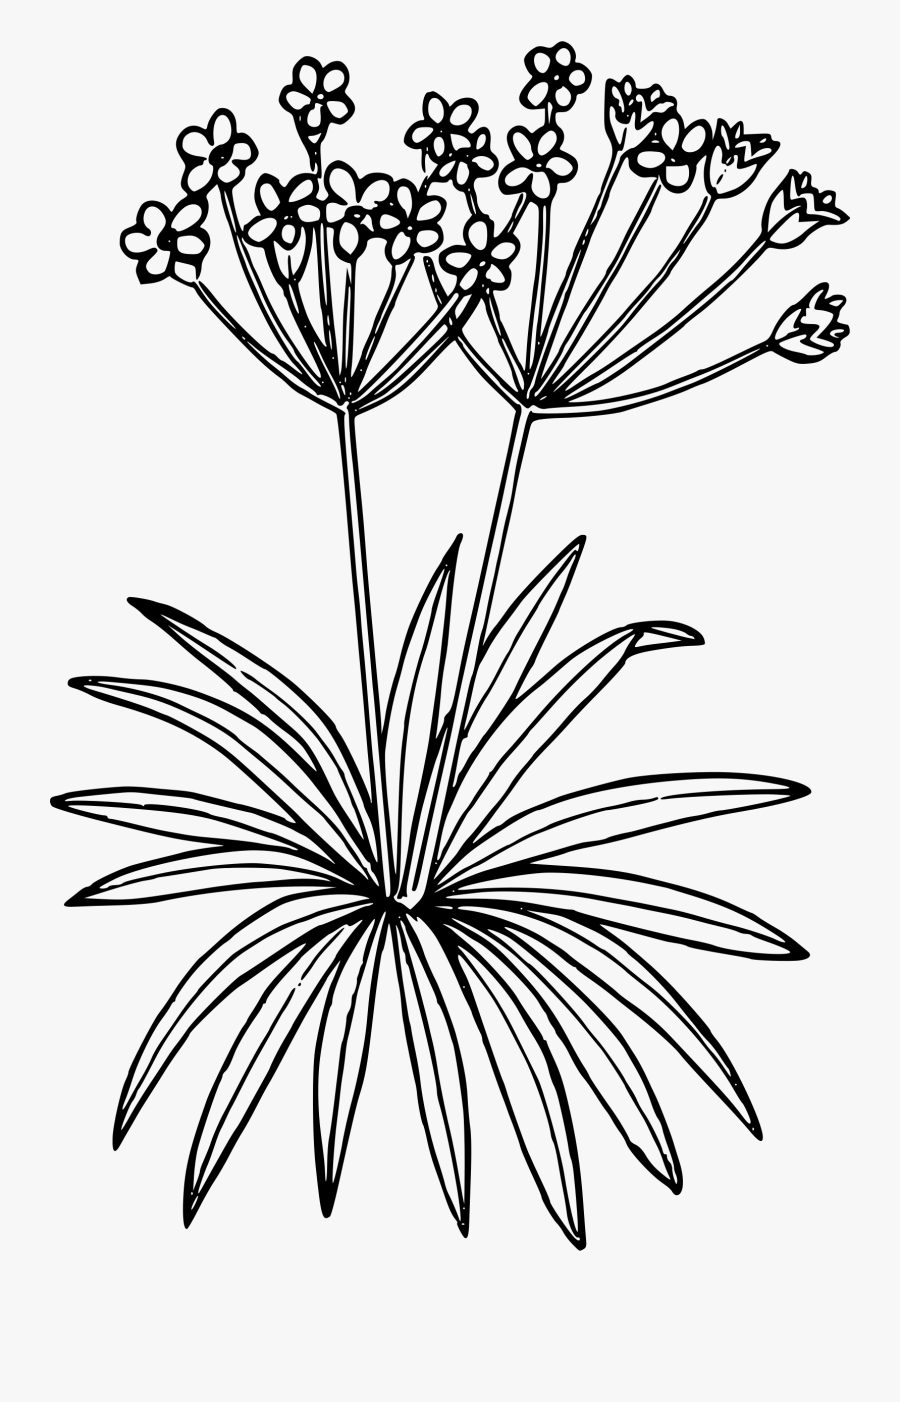 Arctic Flower Cliparts - Draw Tundra Plants, Transparent Clipart